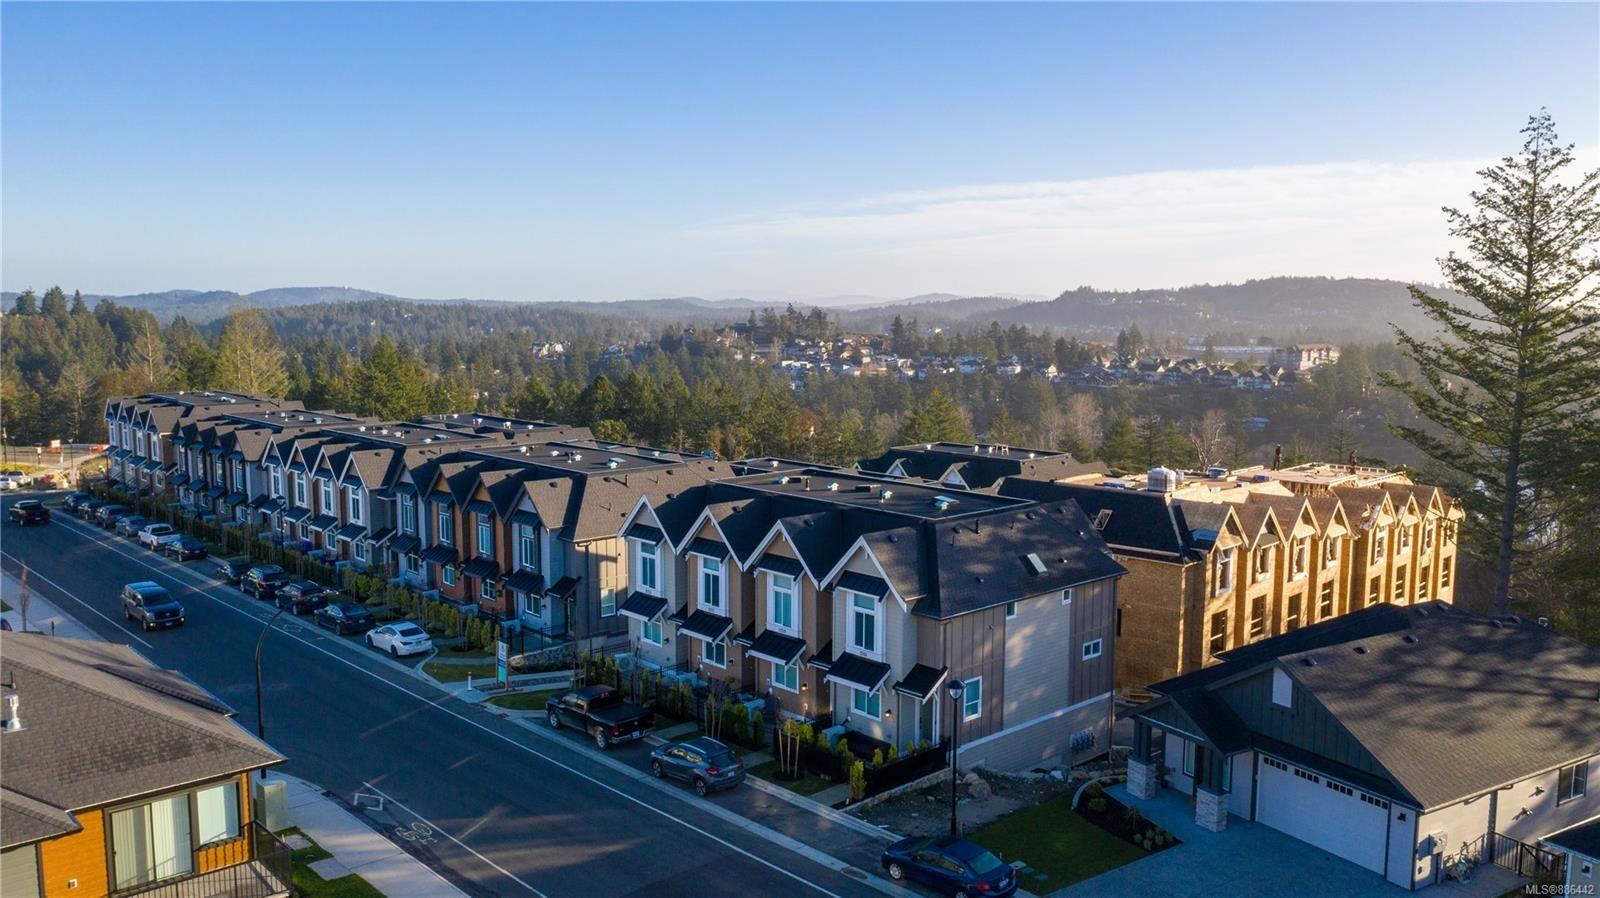 Main Photo: 1107 Moonstone Loop in : La Bear Mountain Row/Townhouse for sale (Langford)  : MLS®# 886442